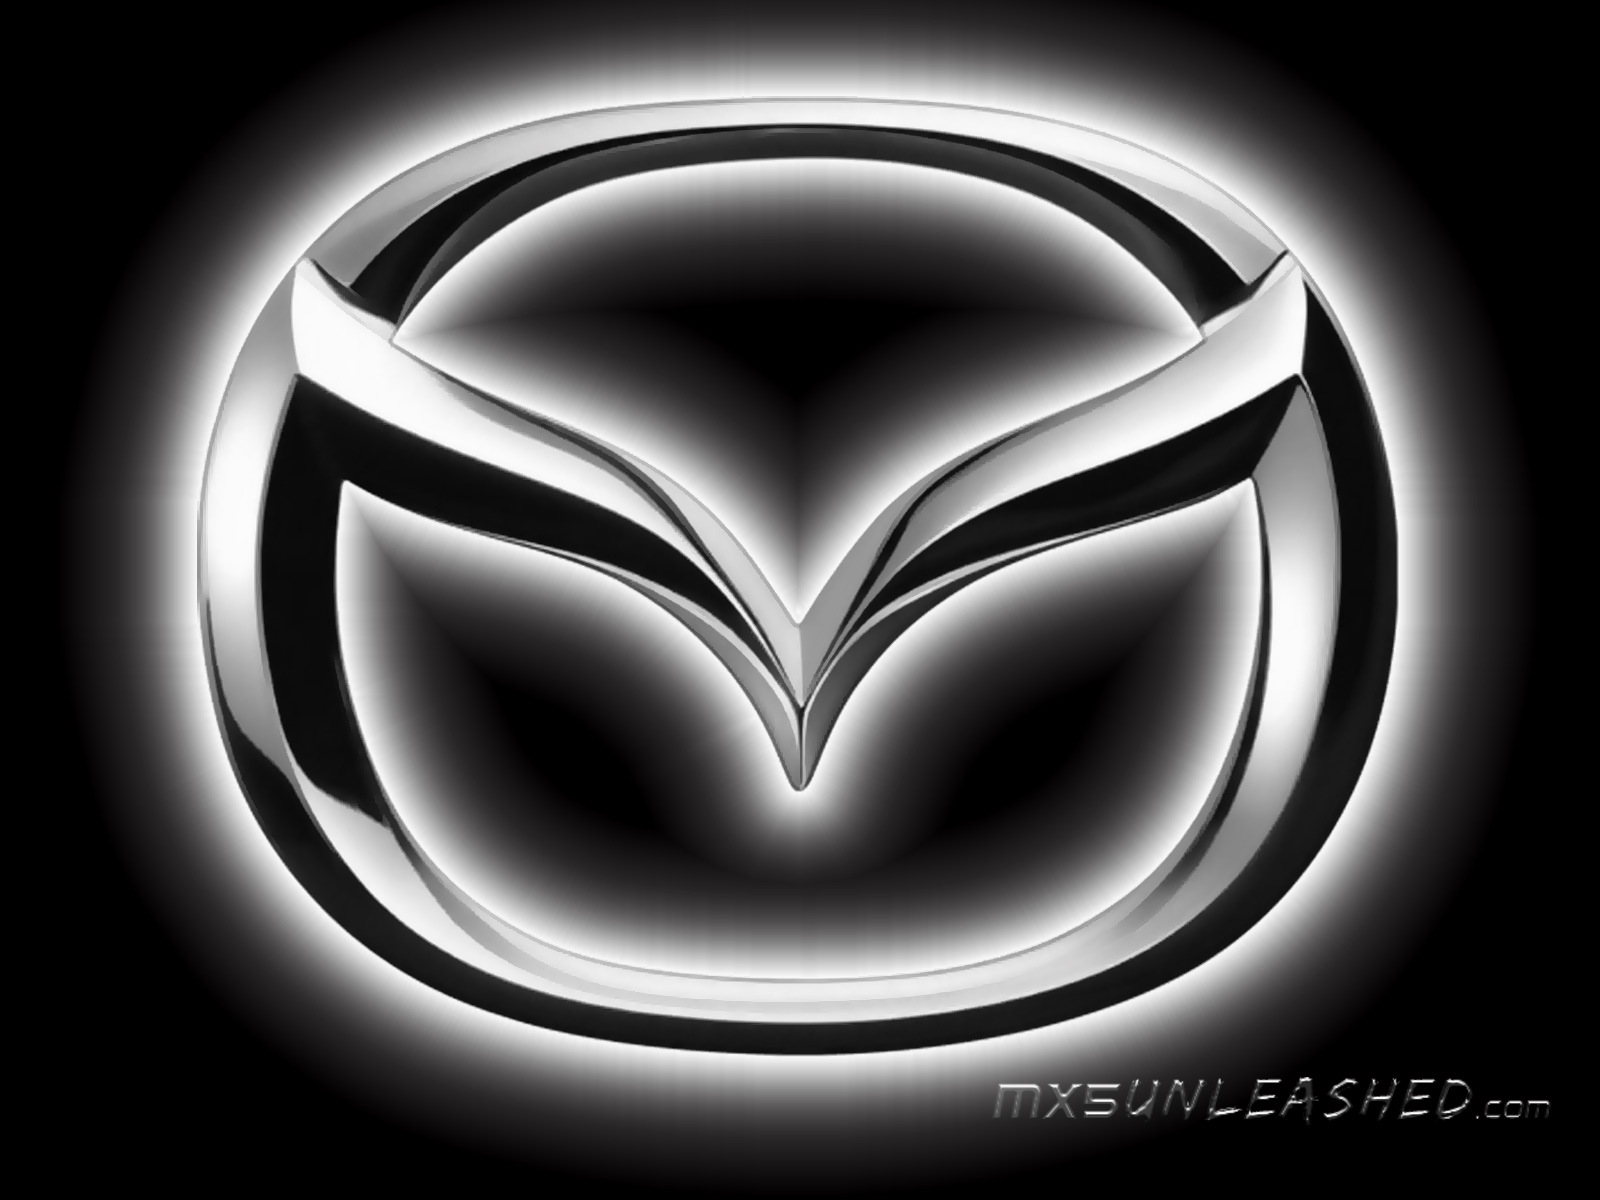 логотип мазда картинки